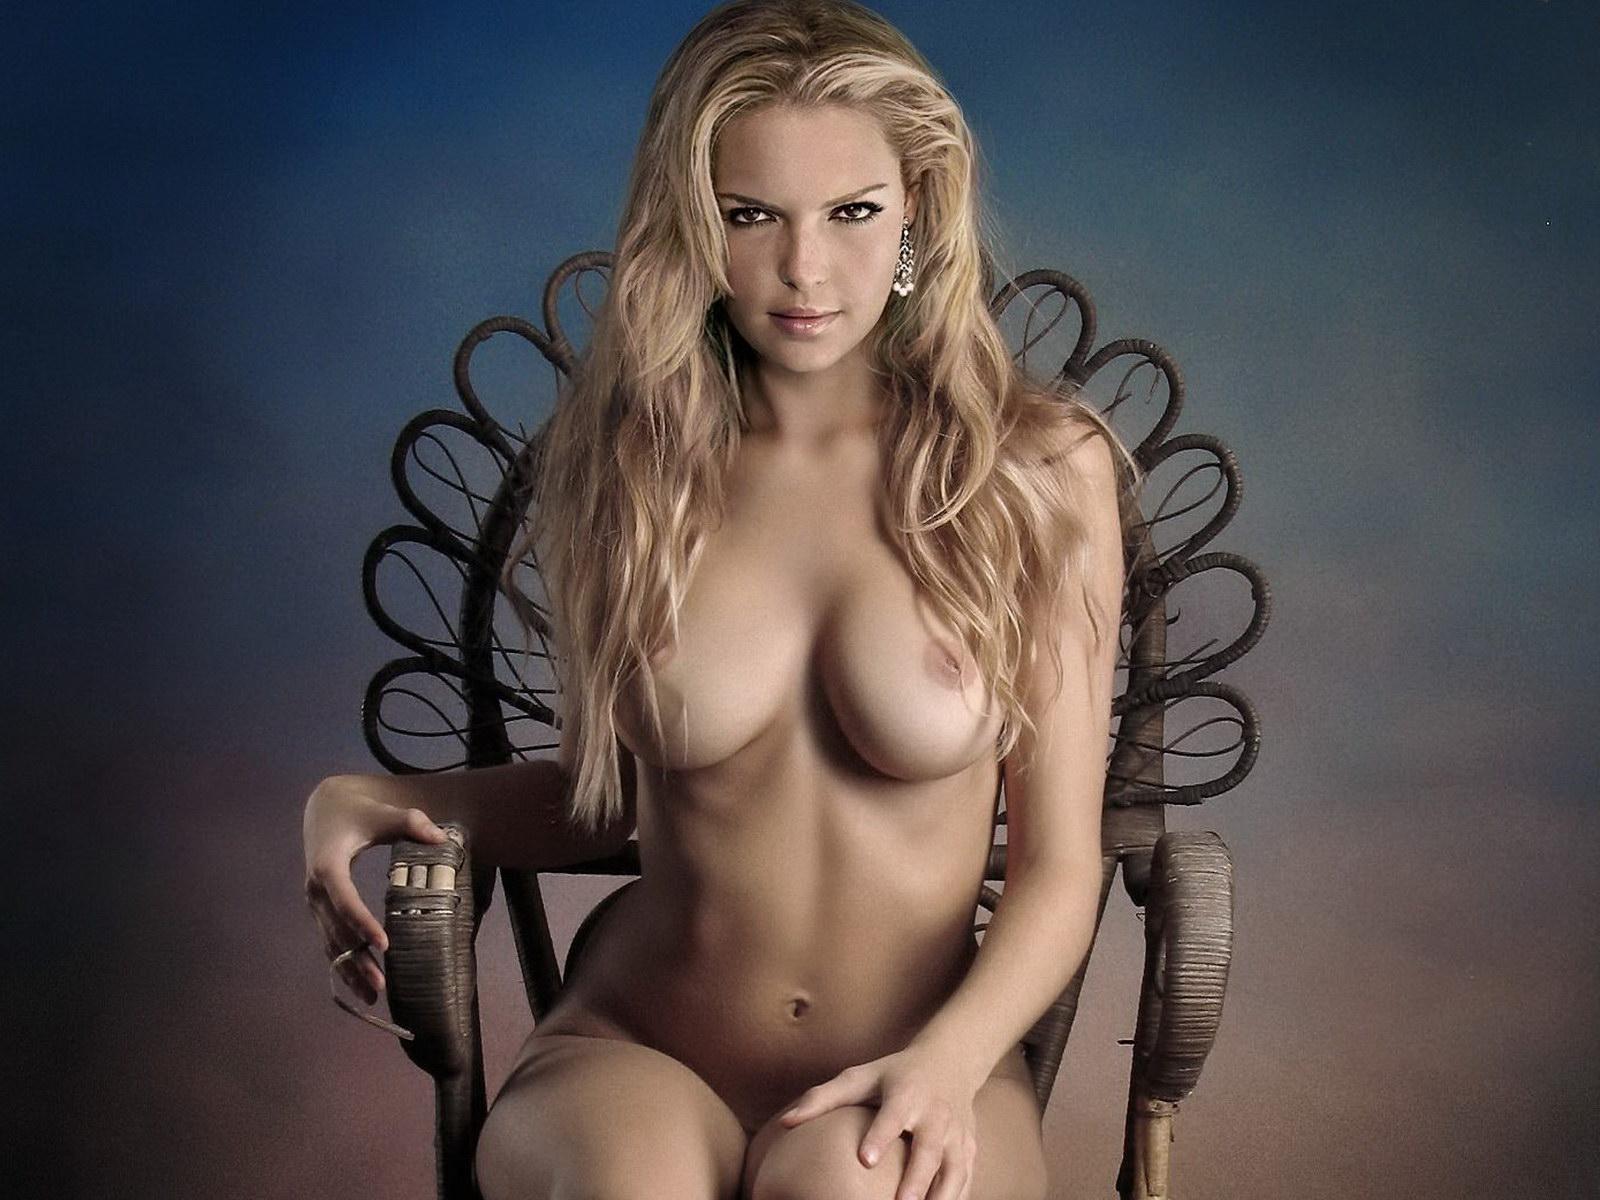 katherine heigl gallery nude jpg 422x640